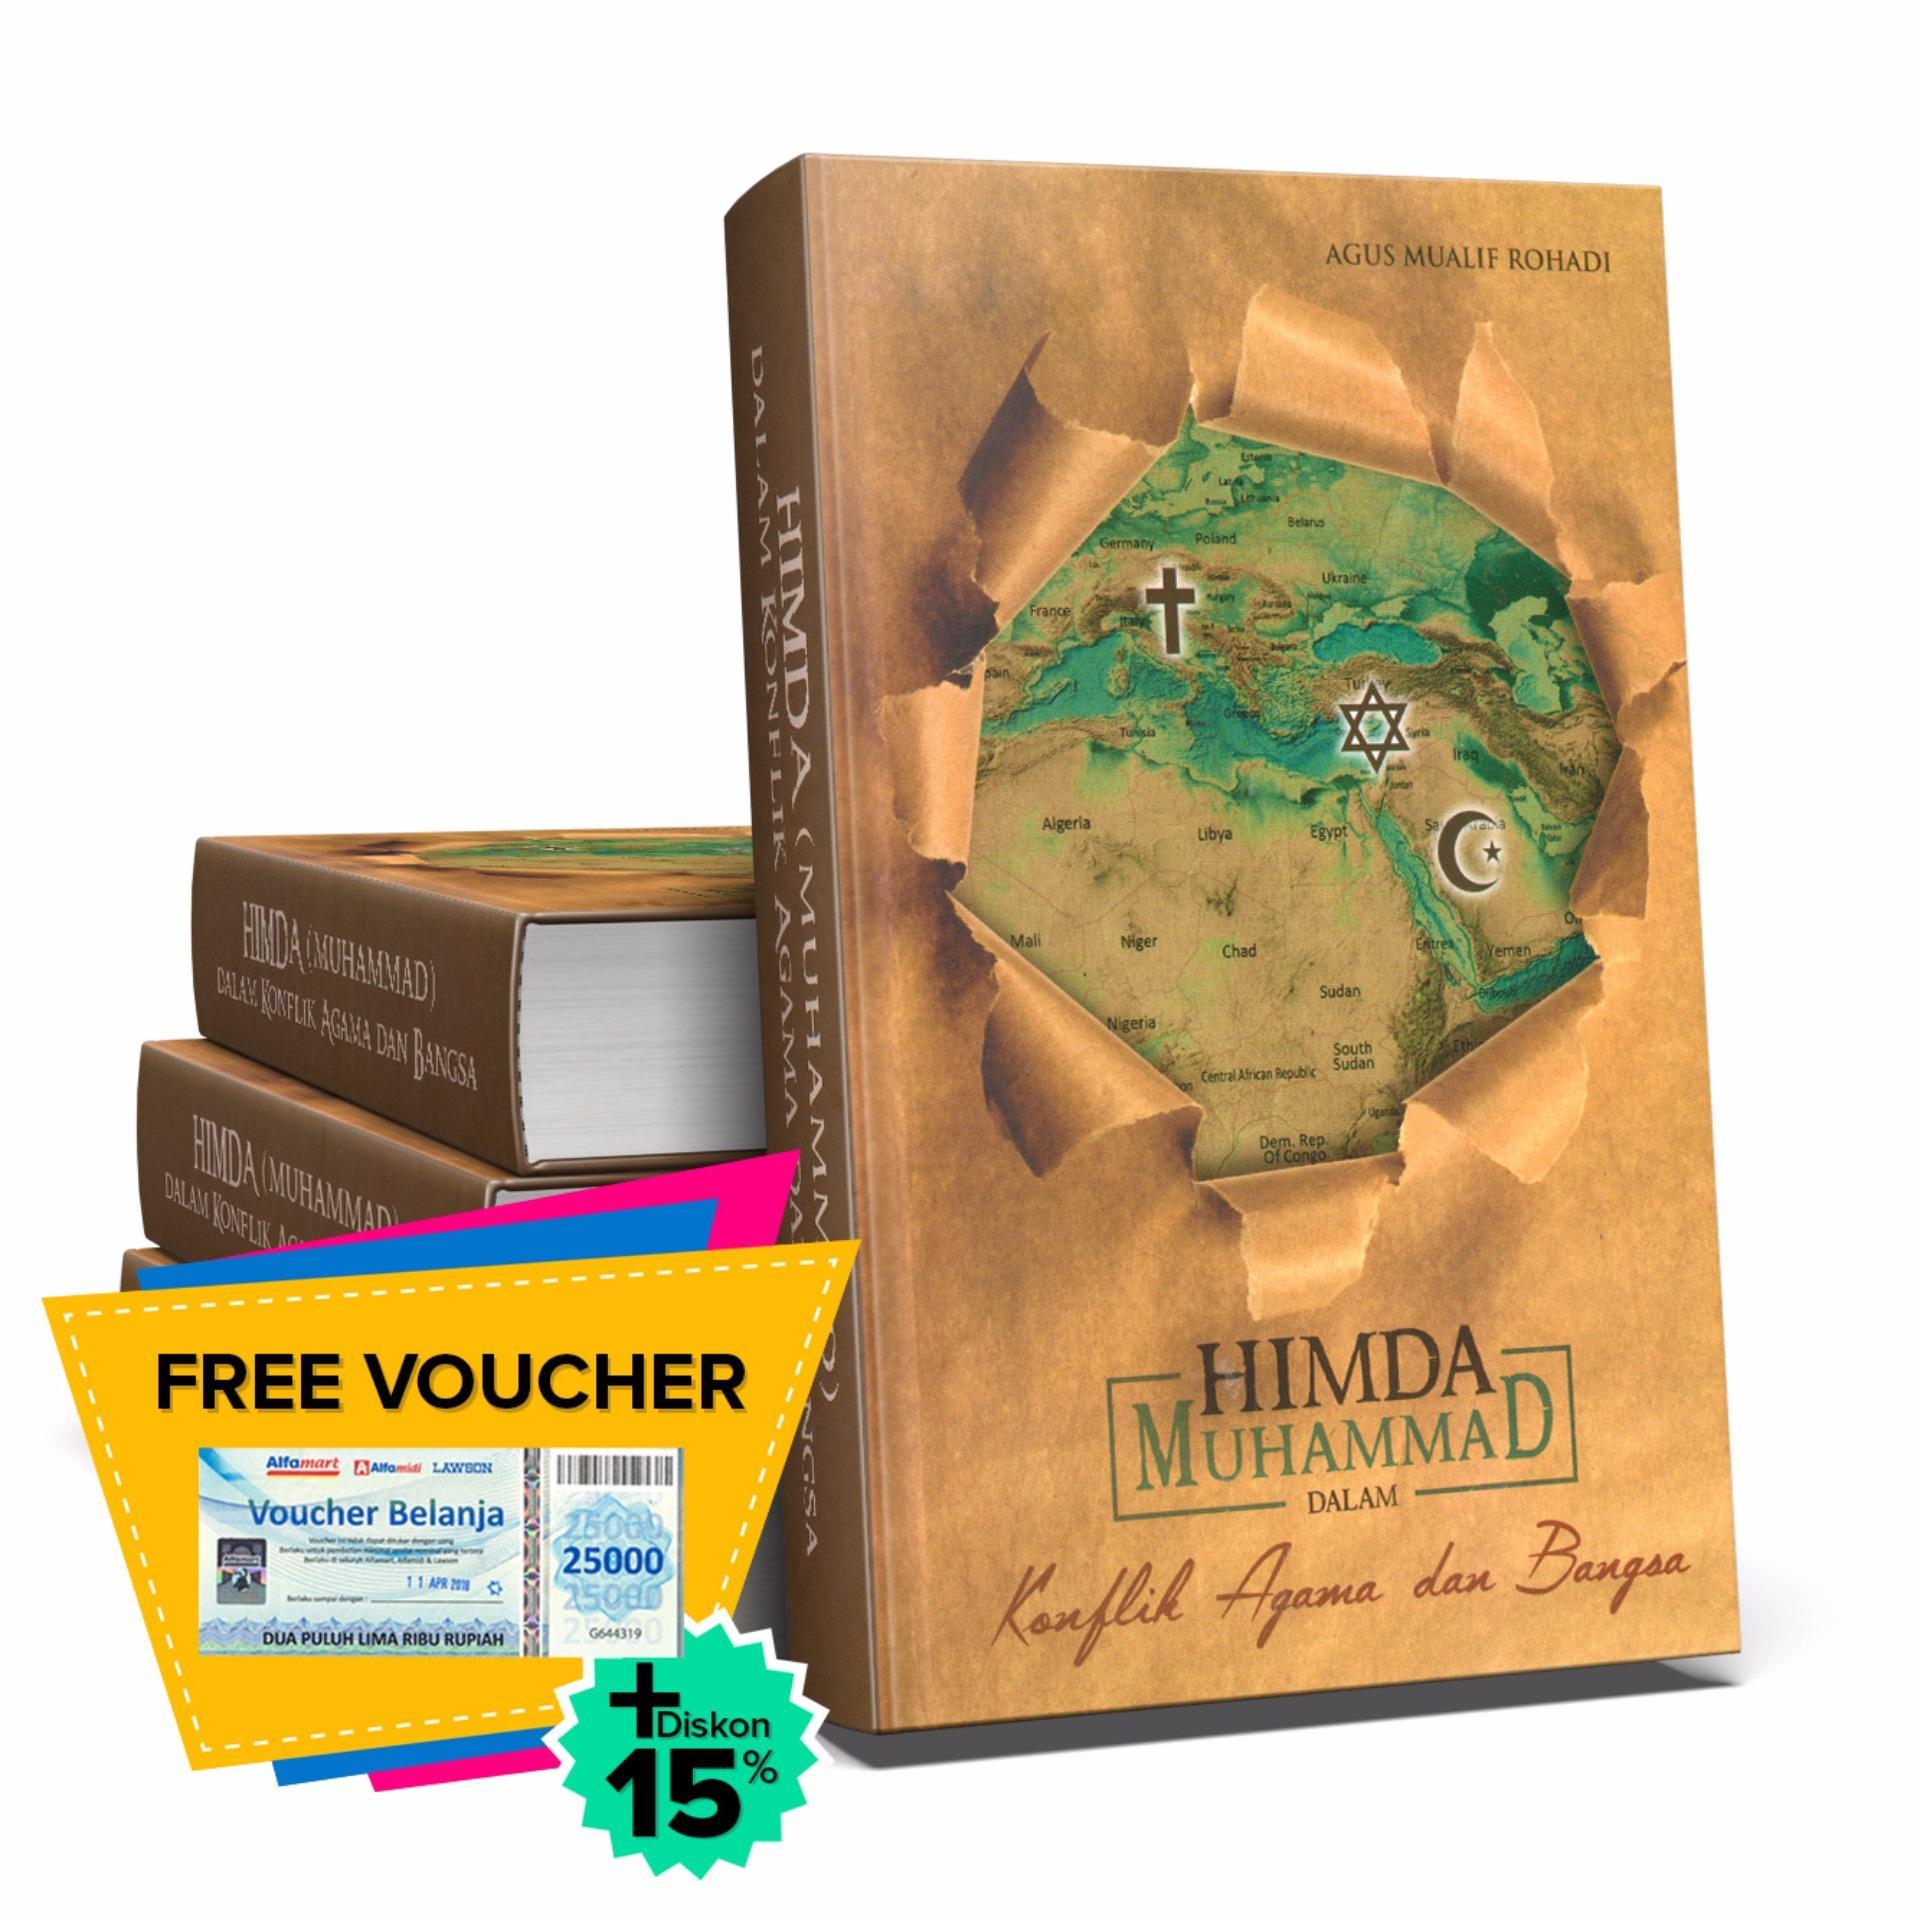 Buku Kita - Himda Muhammad dalam Konflik Agama dan Bangsa